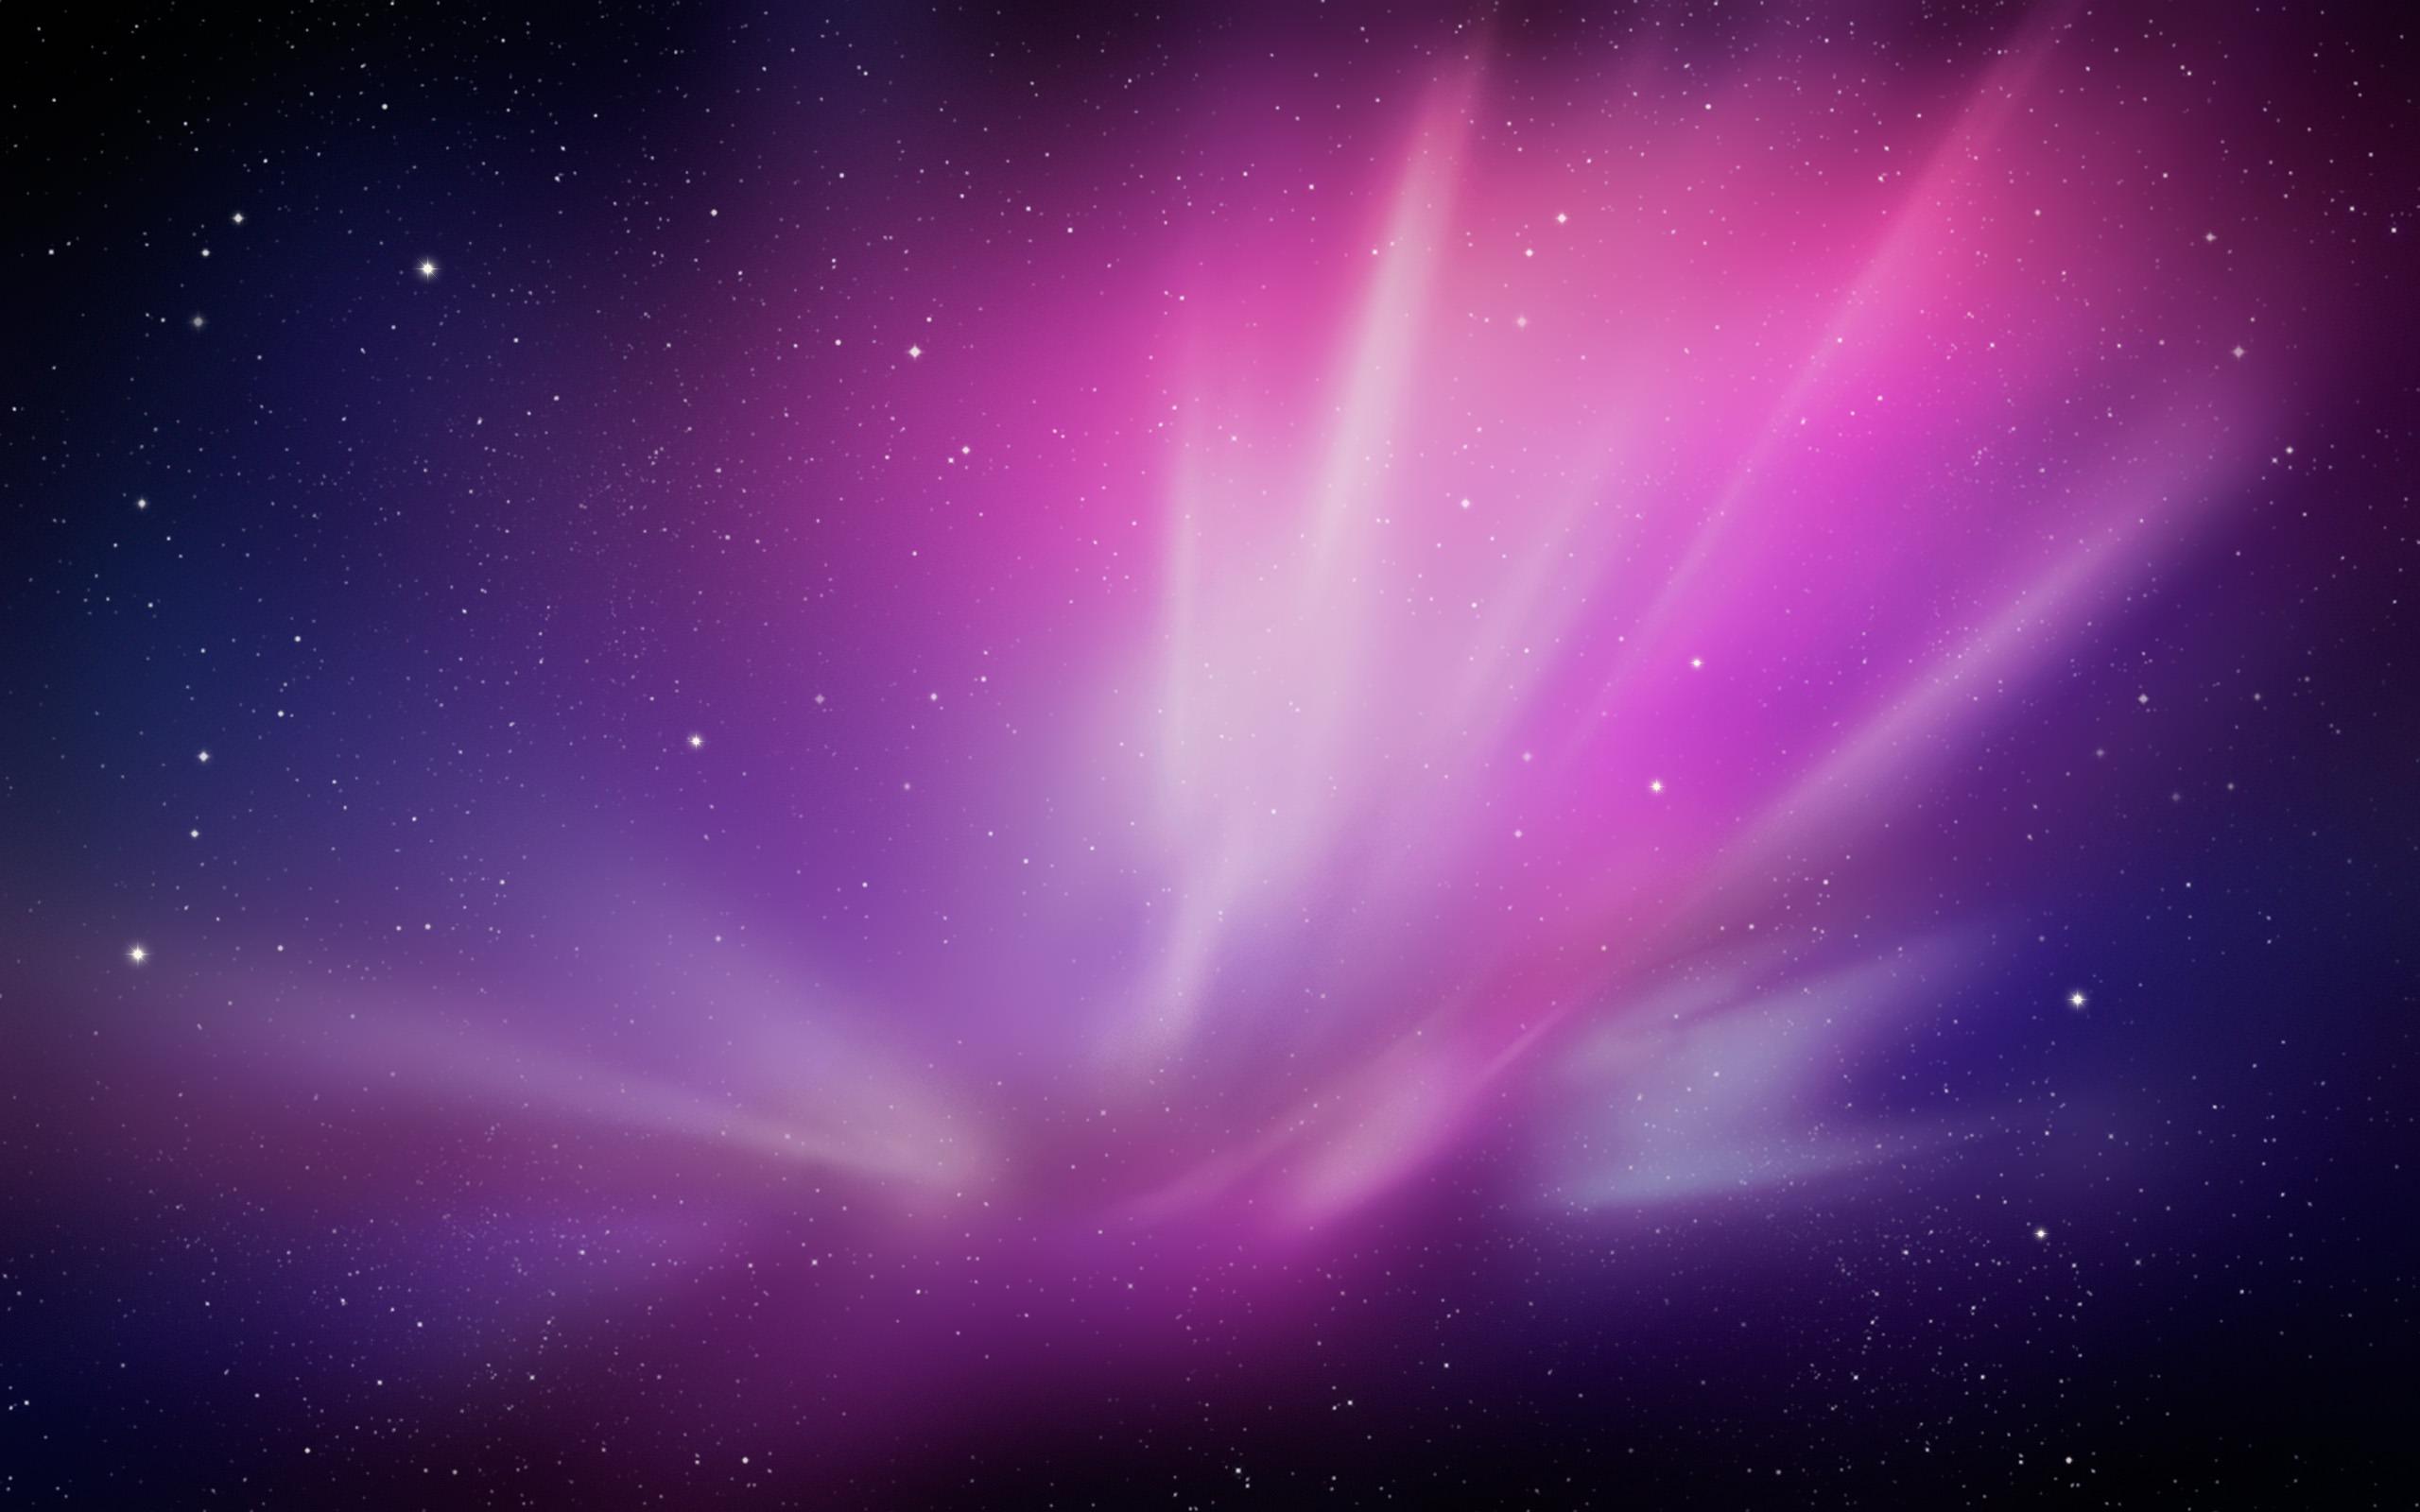 10 Beautiful Mac OS HD Wallpaper and MacBook Pro Retina Display Zebra 2560x1600